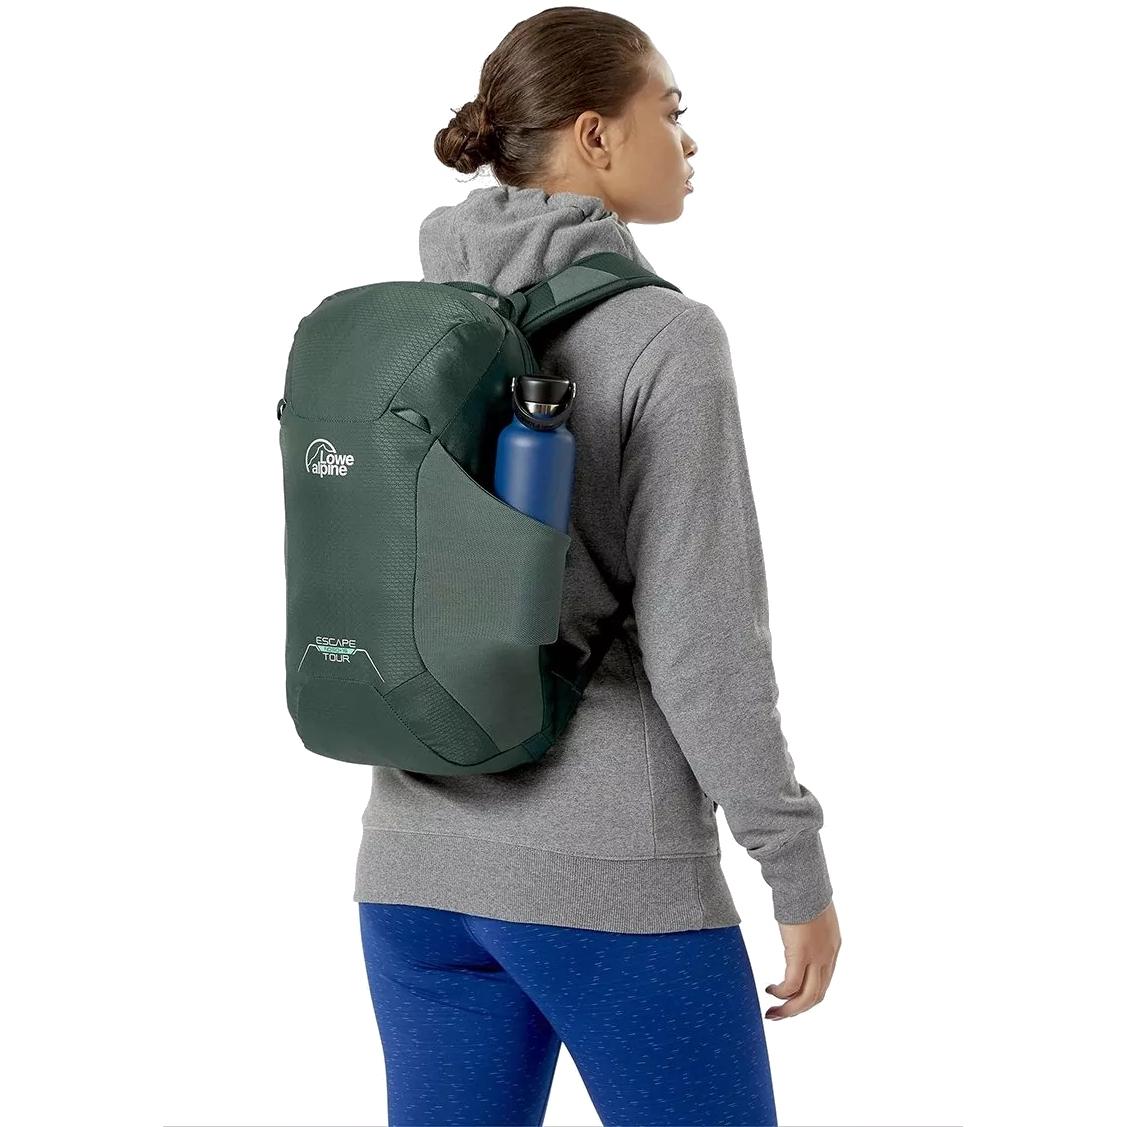 Image of Lowe Alpine Escape Tour ND 50+15 Women's Backpack - Black